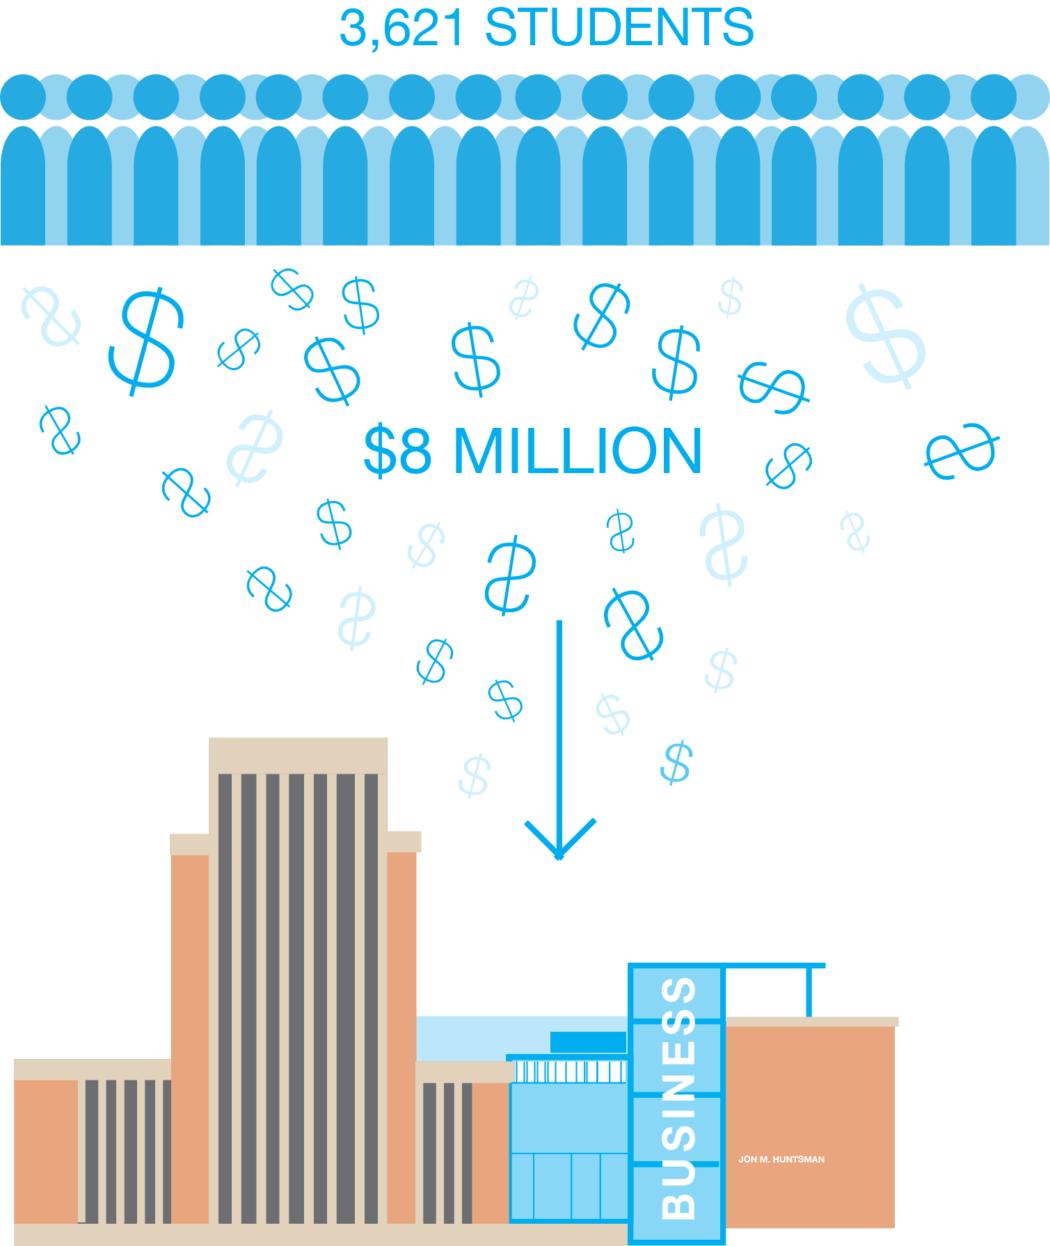 Jon M. Huntsman商学院每年向3621名学生收取800多万美元差别学费,咨询委员会应该监督这笔钱的花费。但事实却是,委员会从来没有见过面